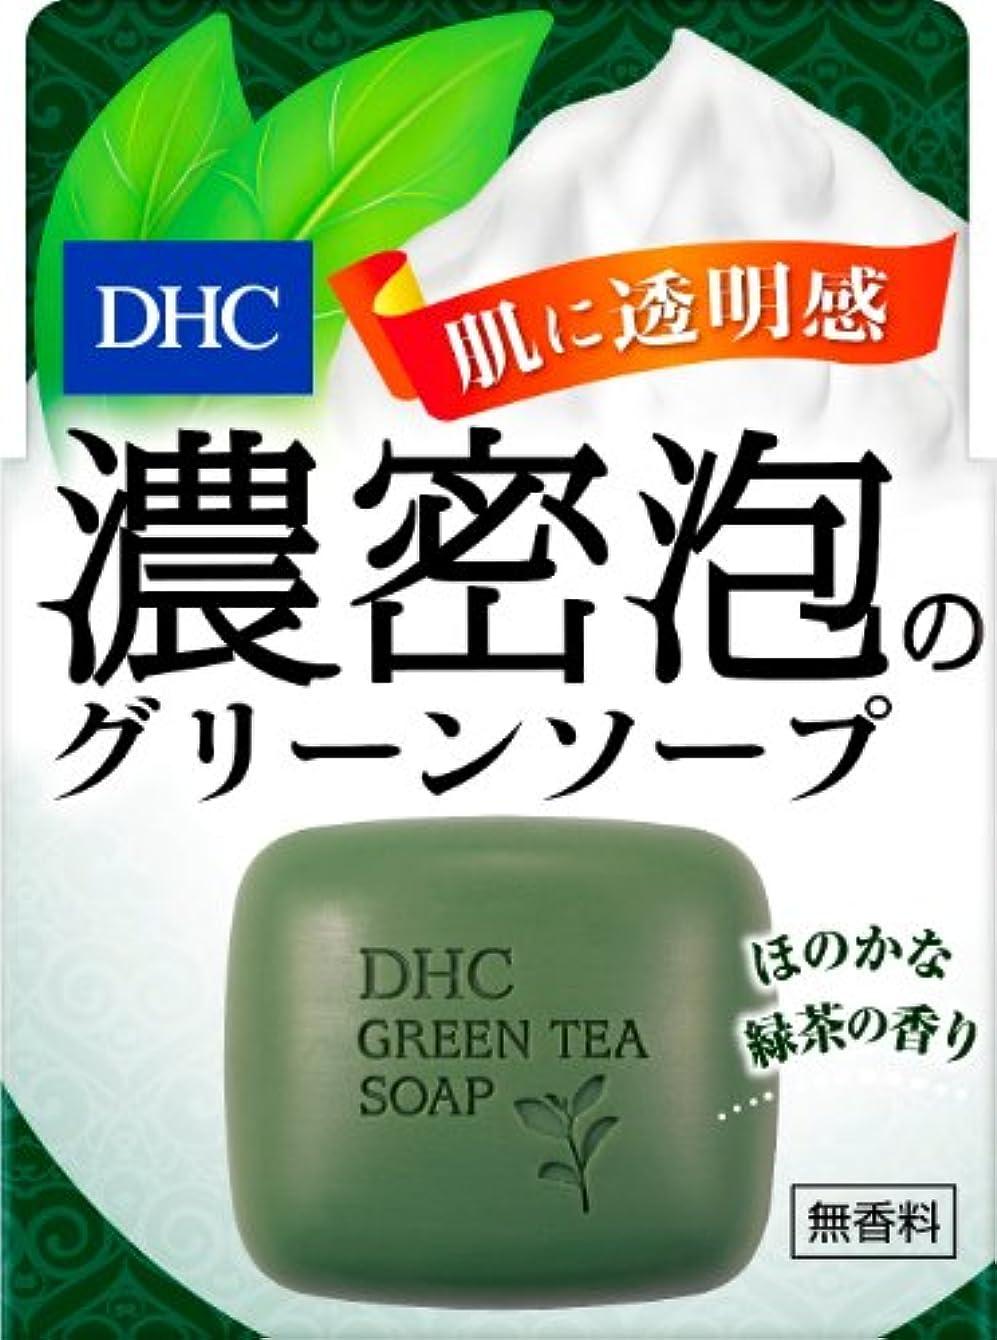 DHC グリーンソープ (SS) 60g